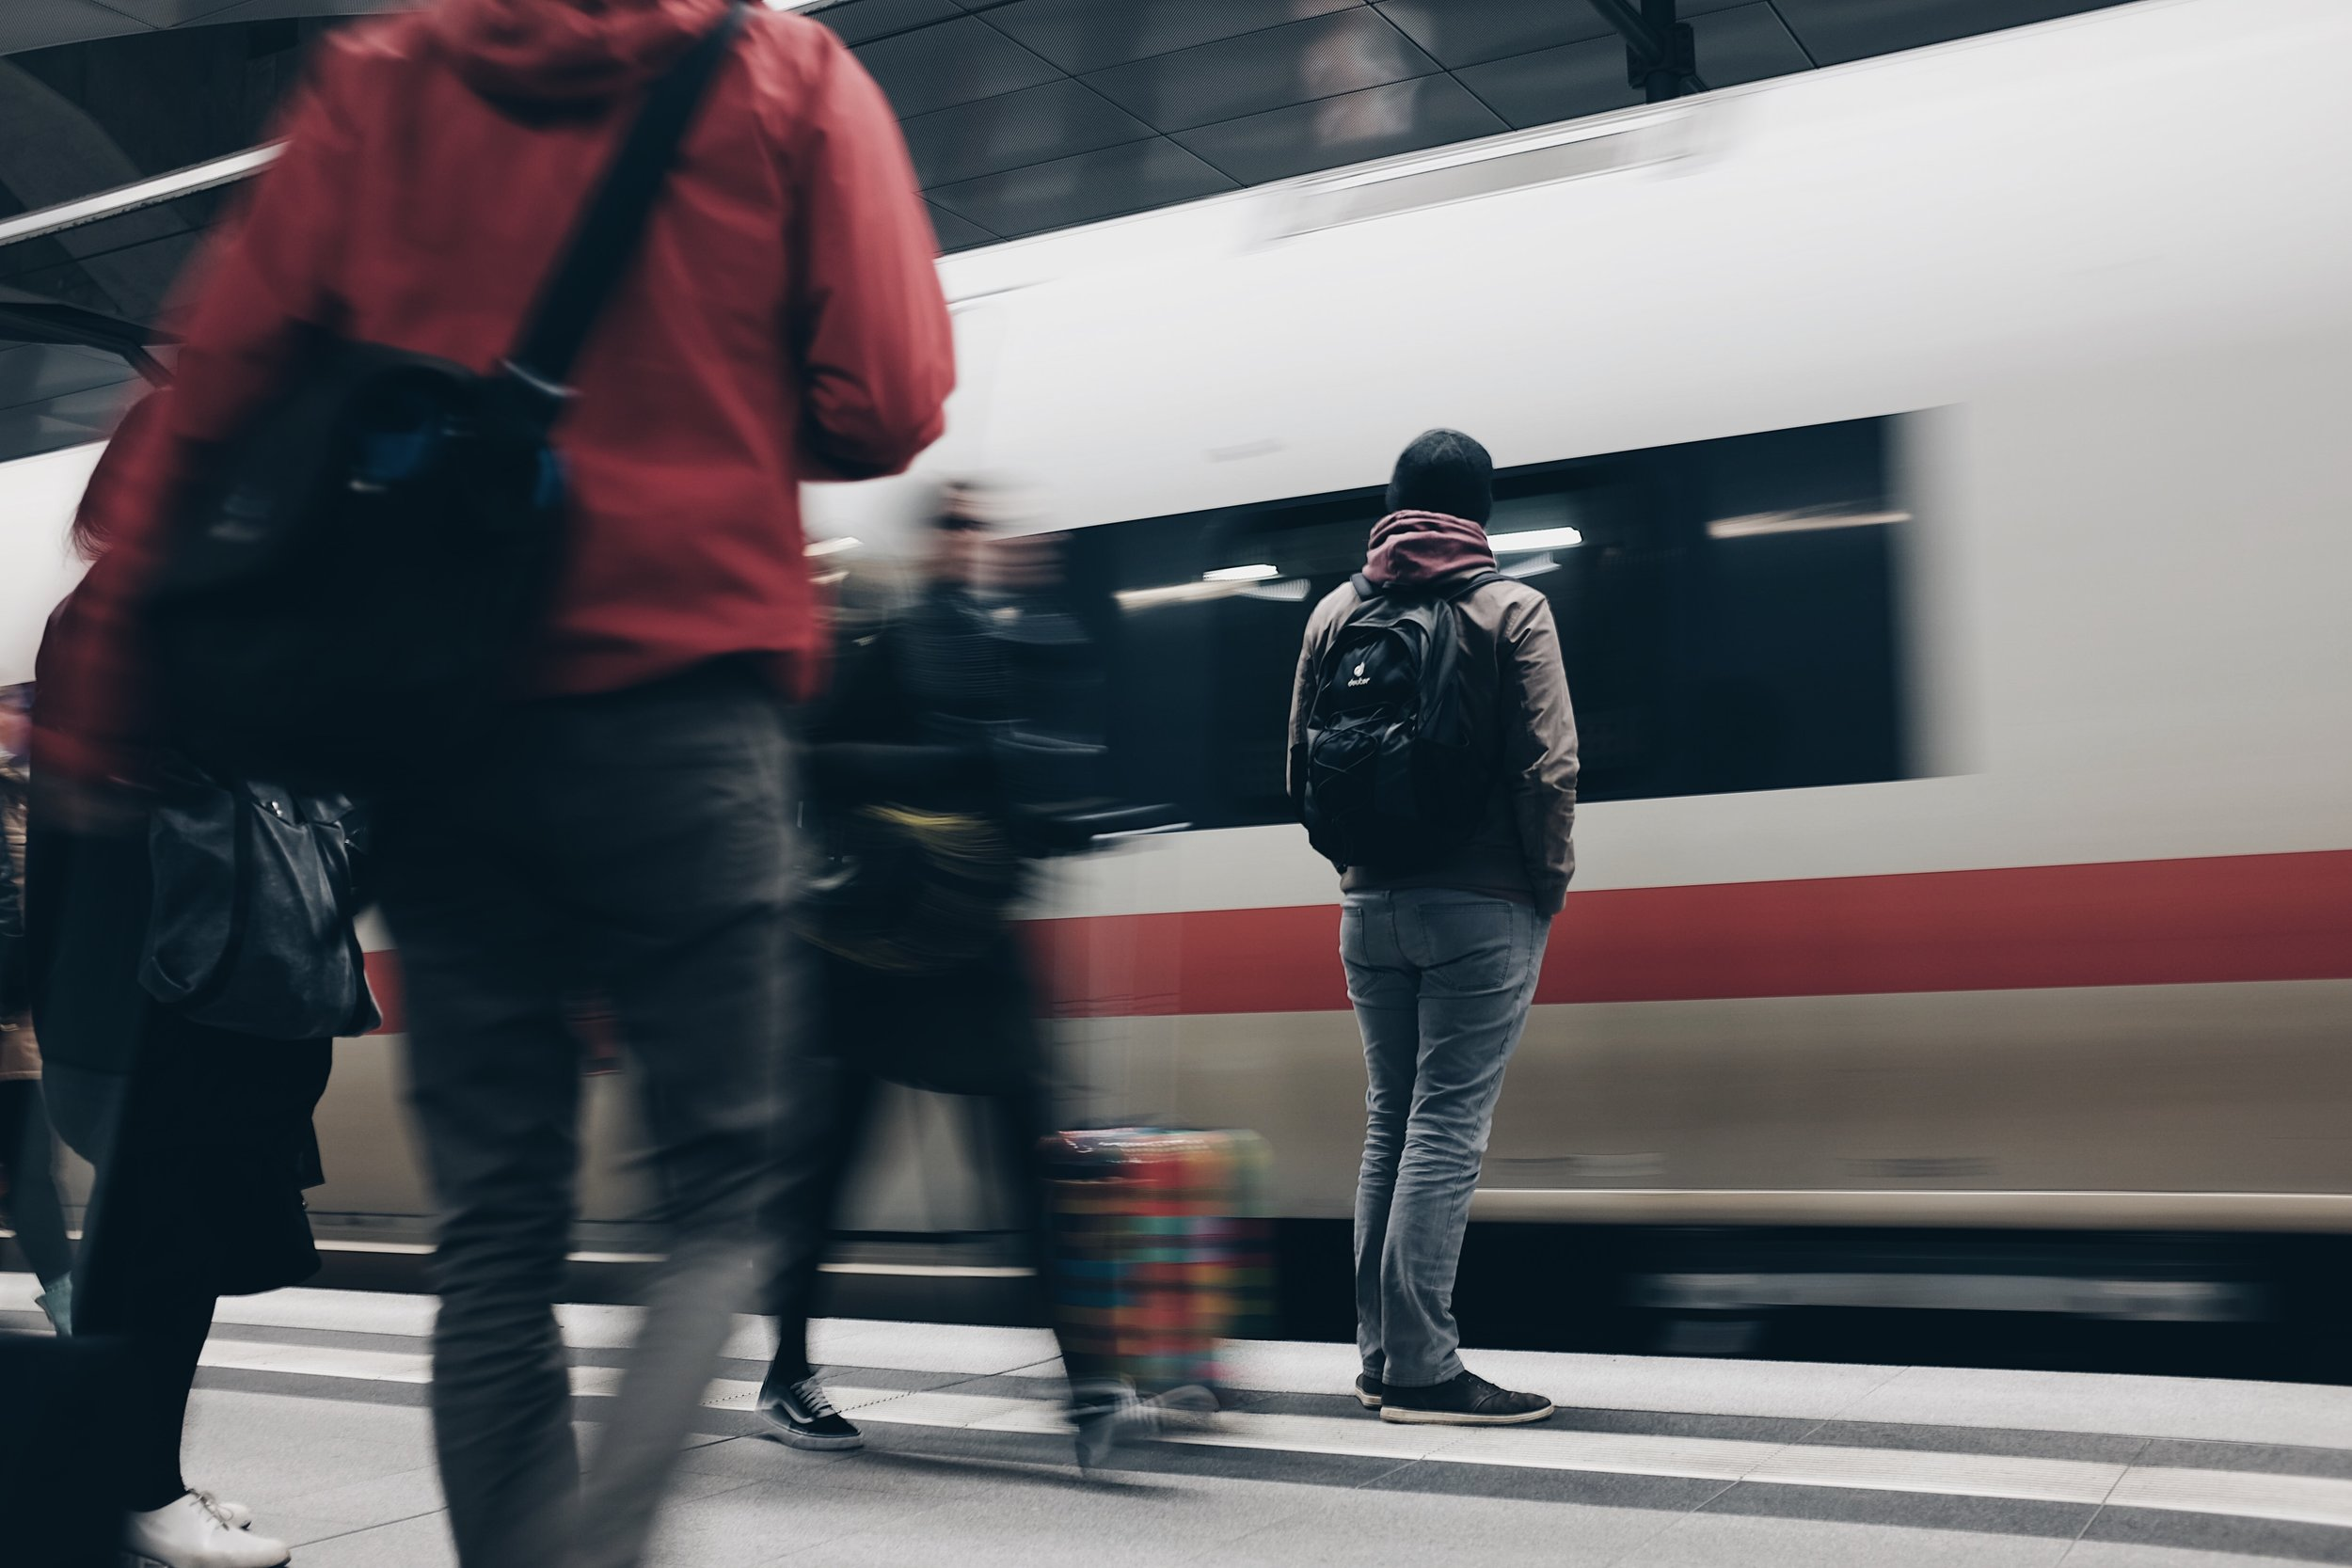 moving train.jpg